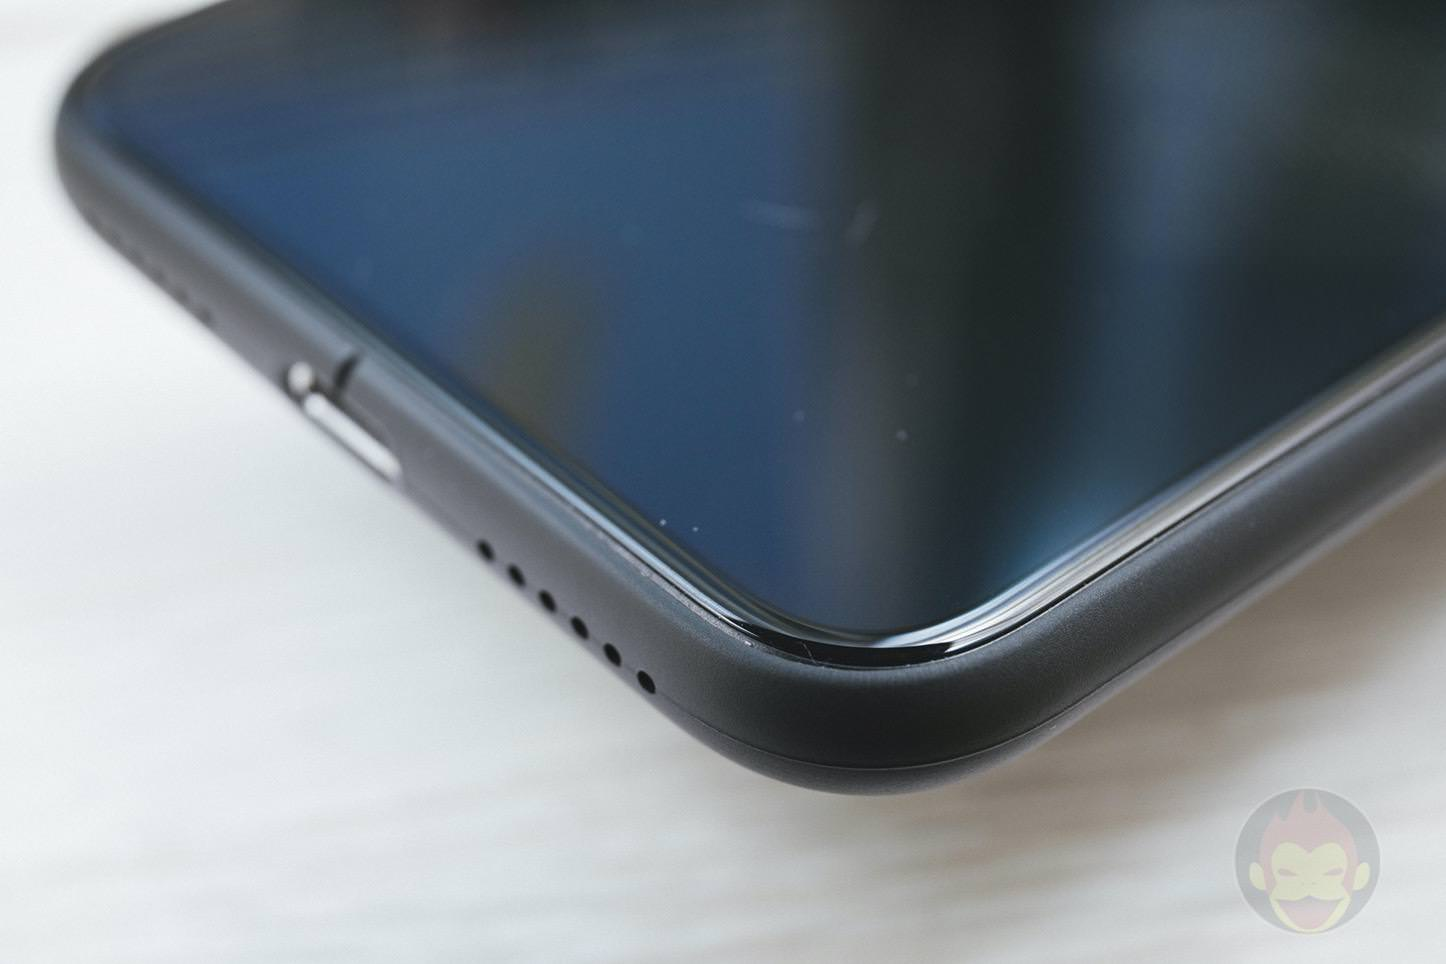 Mynus-iPhoneX-Case-Black-White-12.jpg